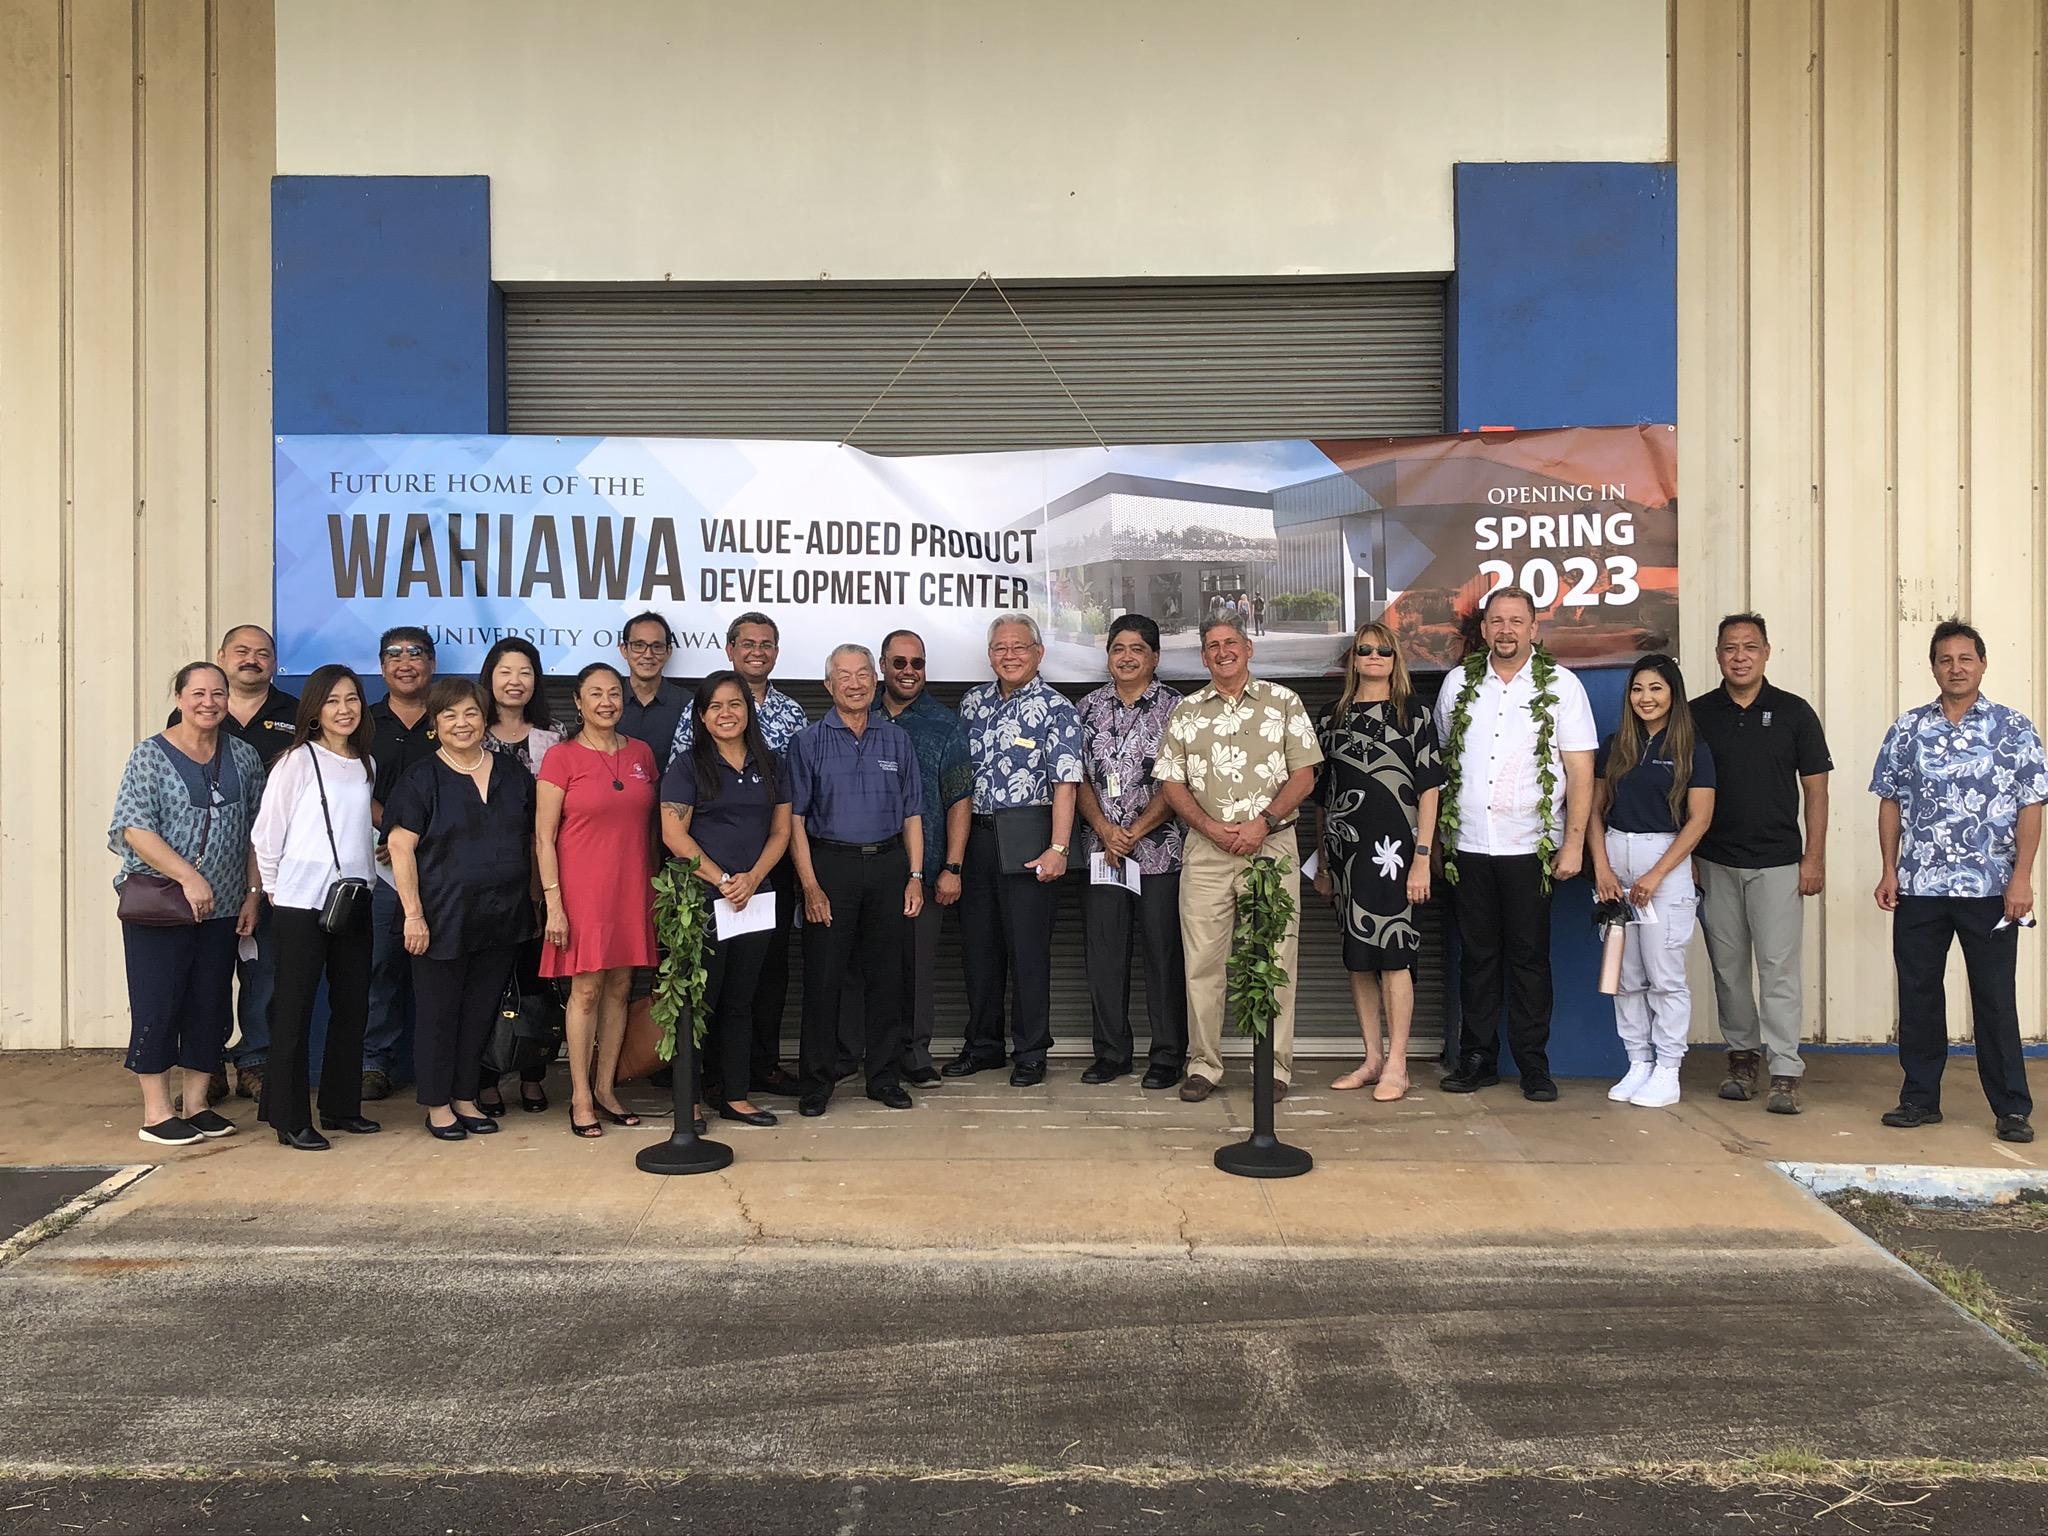 University of Hawai'i Value-Added Product Development Center Holds Groundbreaking